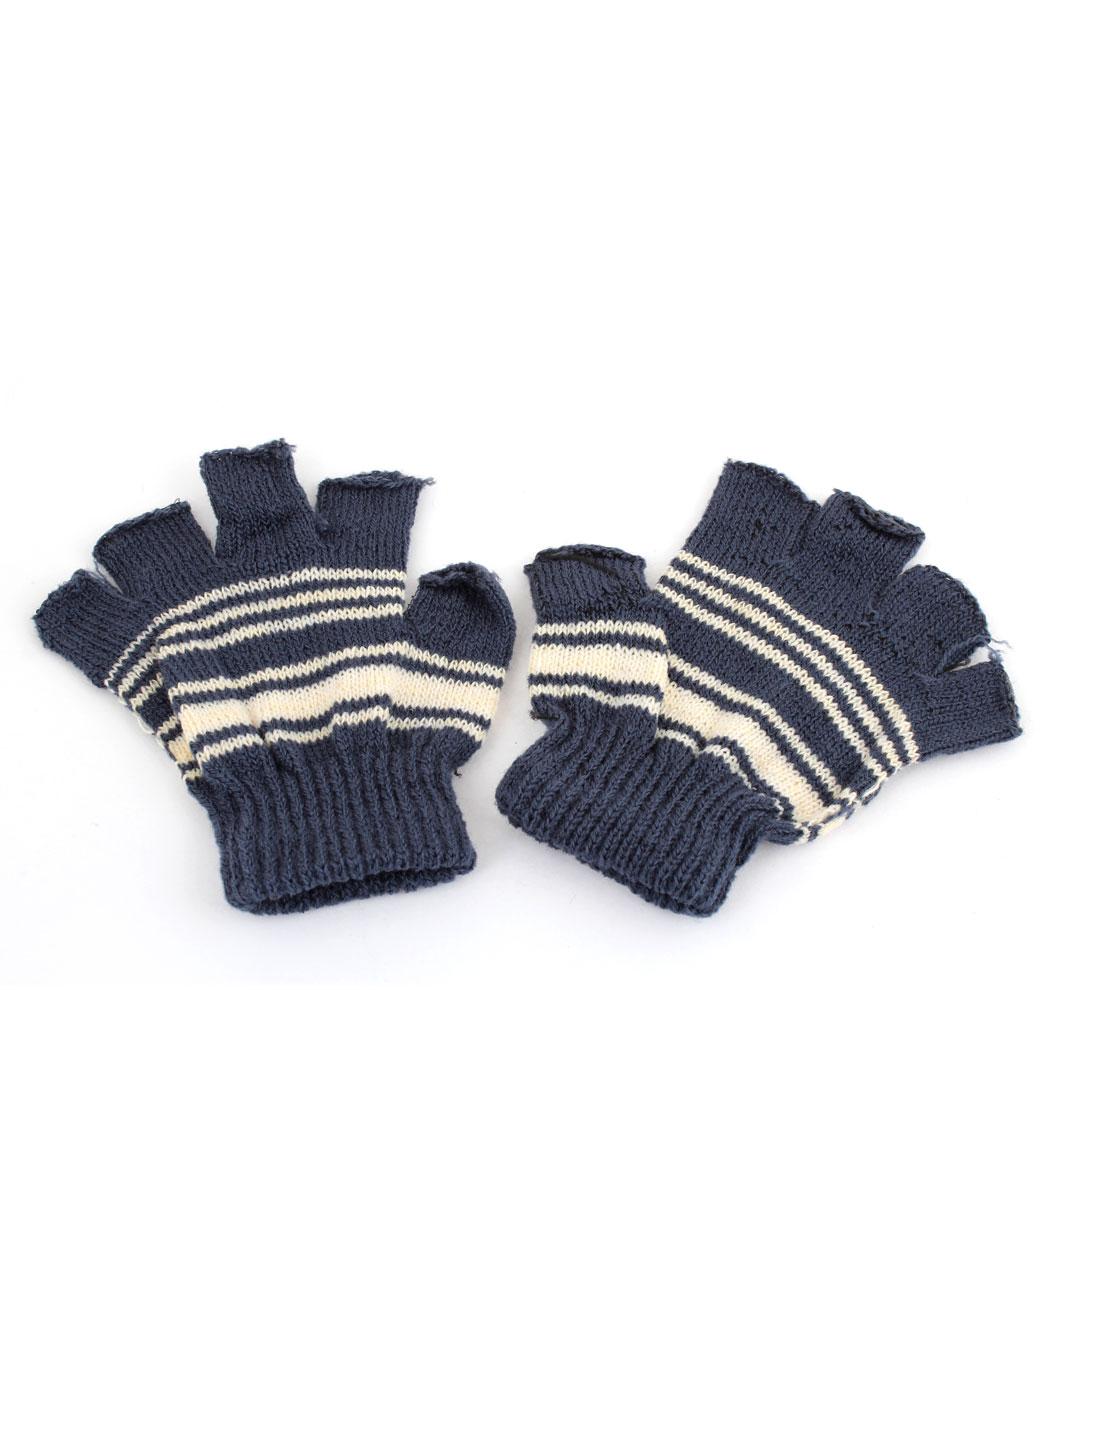 Child Dark Gray Acrylic Stripes Pattern Kintting Fingerless Gloves Pair